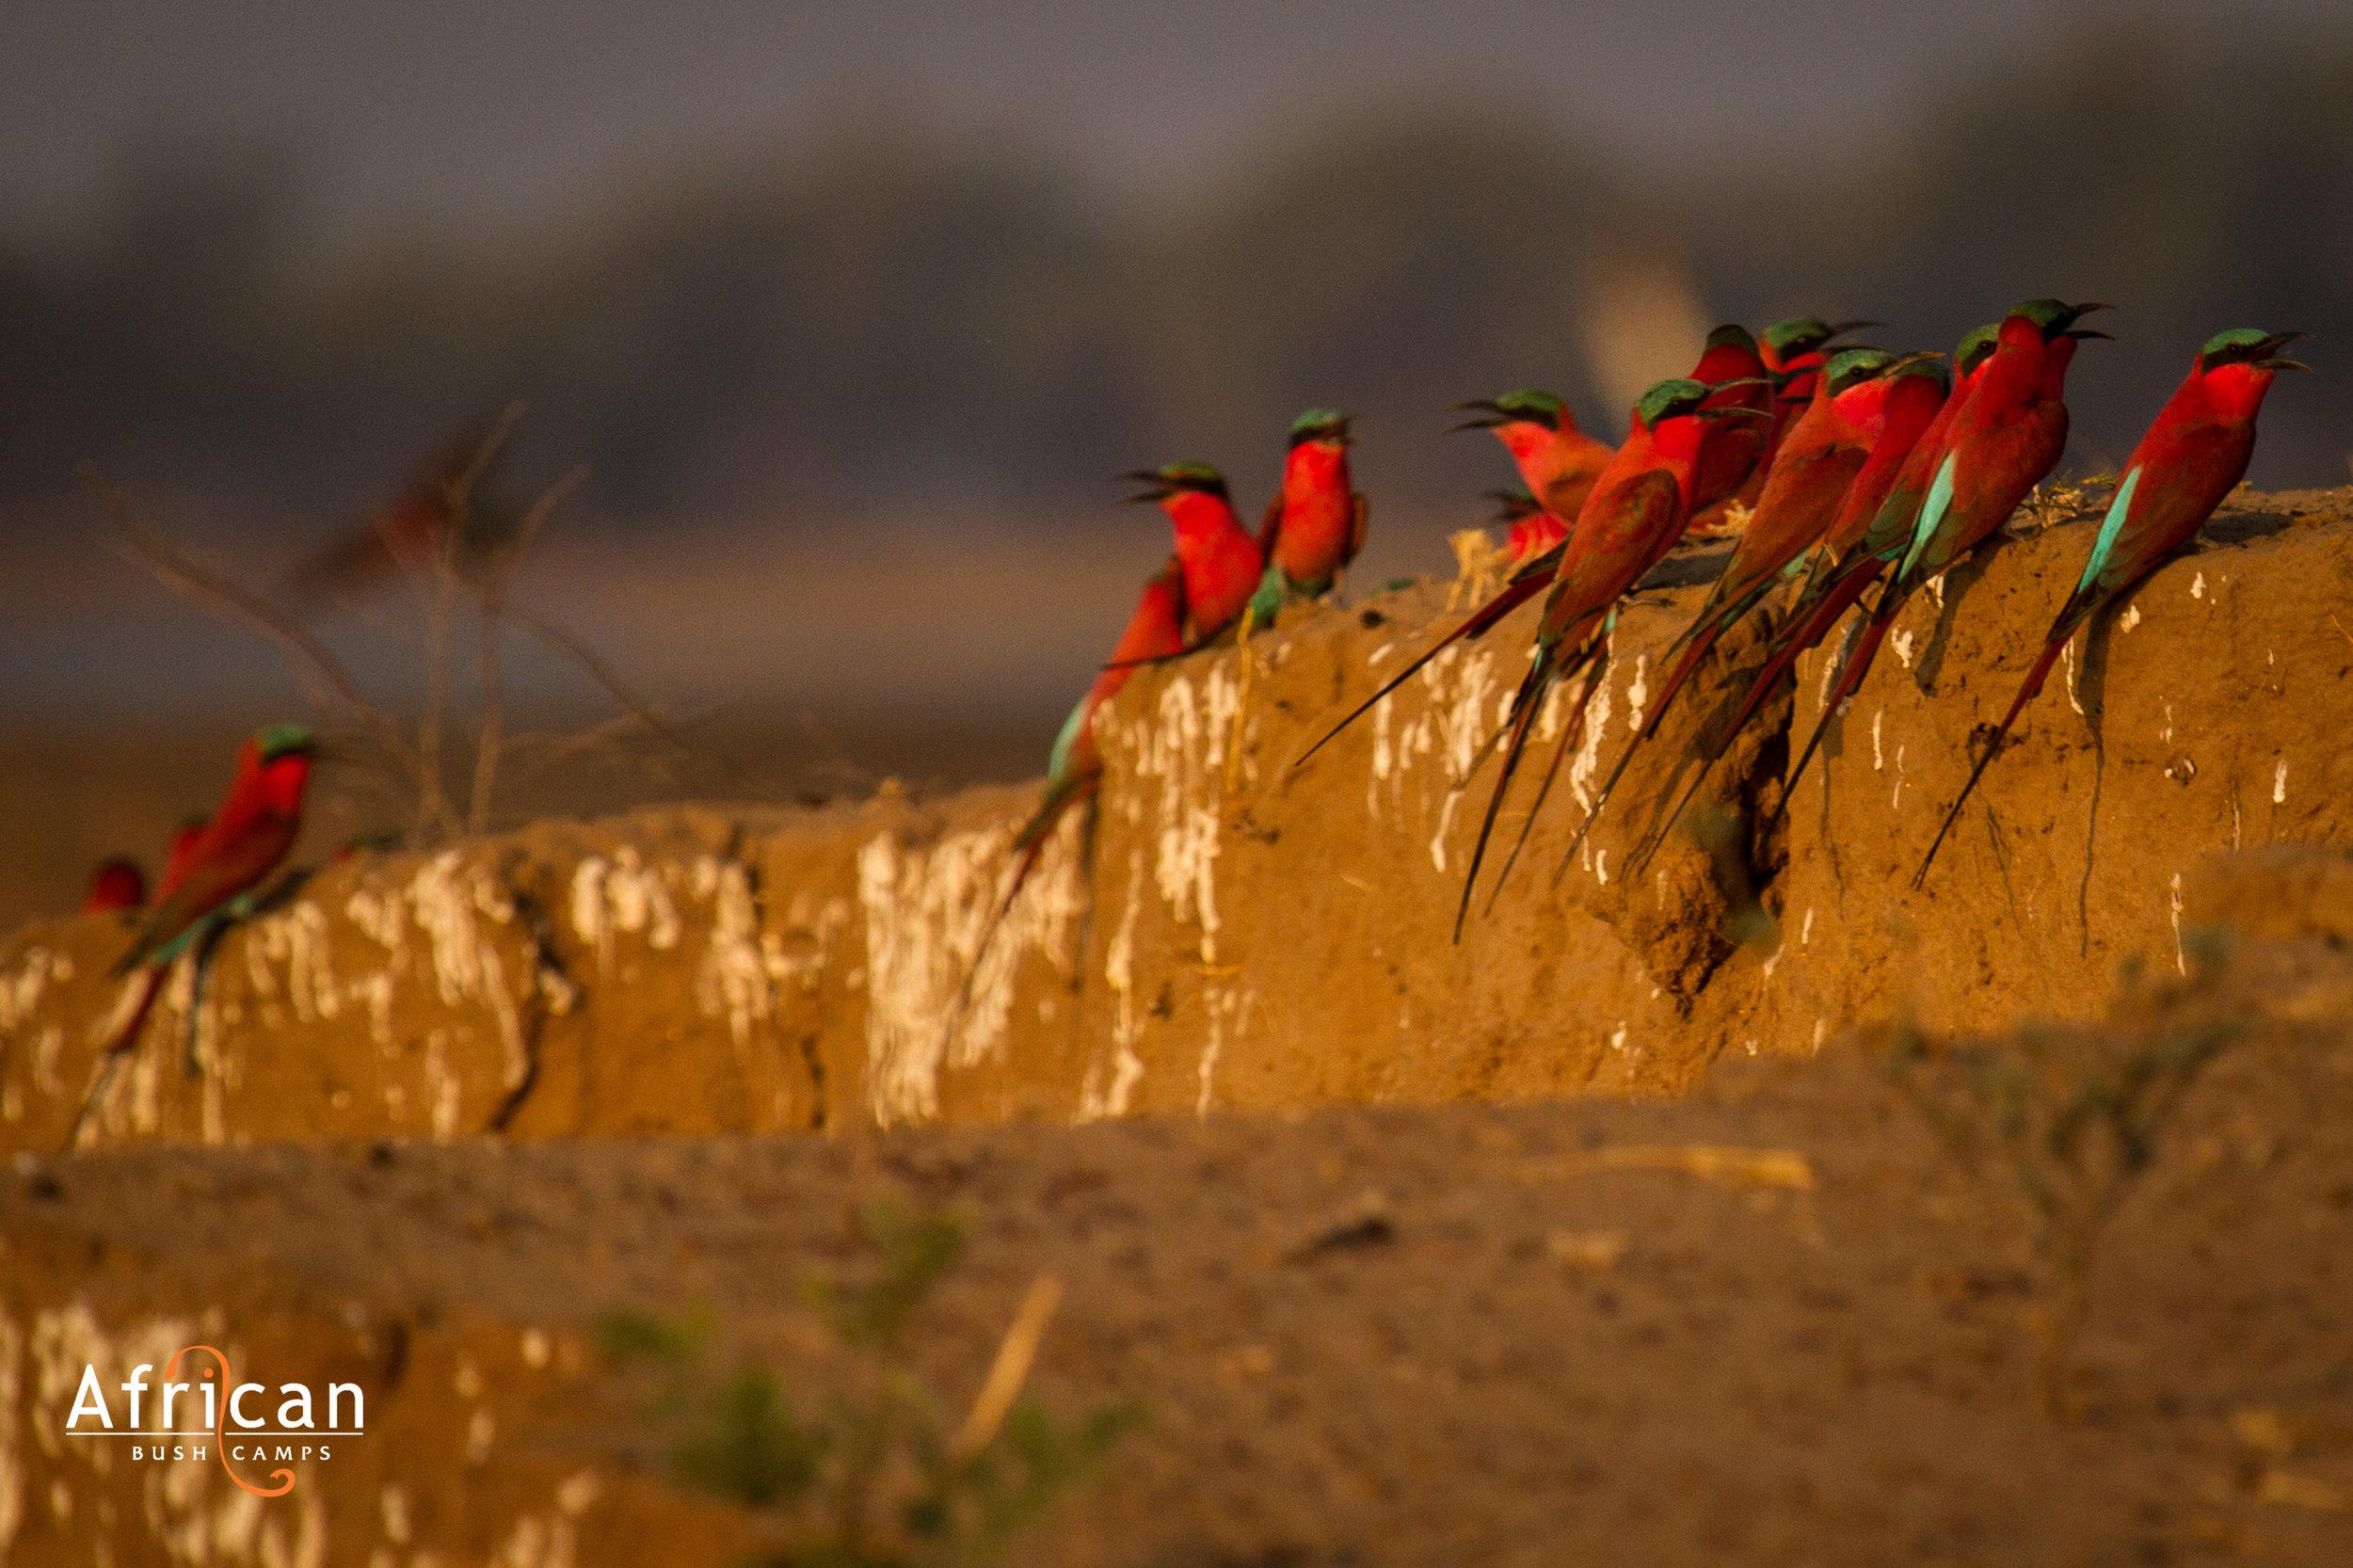 carmine_bee_eatters_zambezi_expeditions_mana_pools_national_park_zimbabwe_wildlife_safri_african_bush_camps.jpg